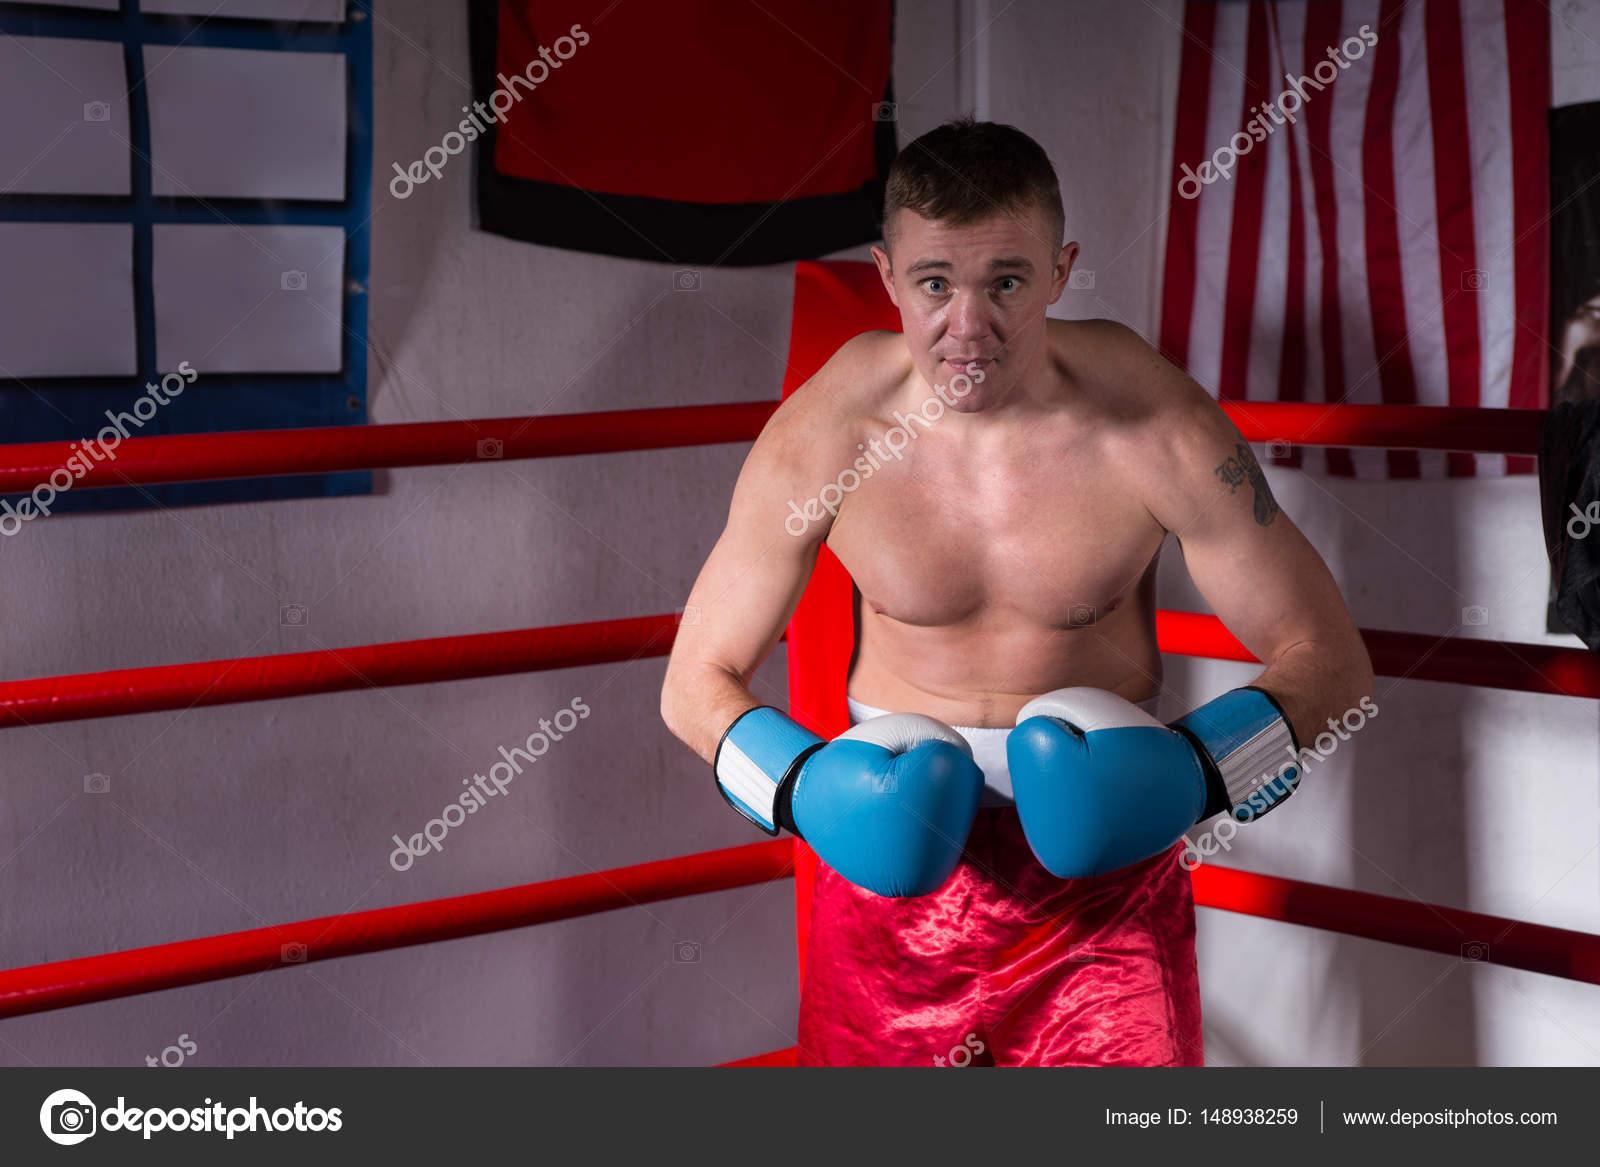 golie-bokseri-muzhchini-letsya-vlagalisha